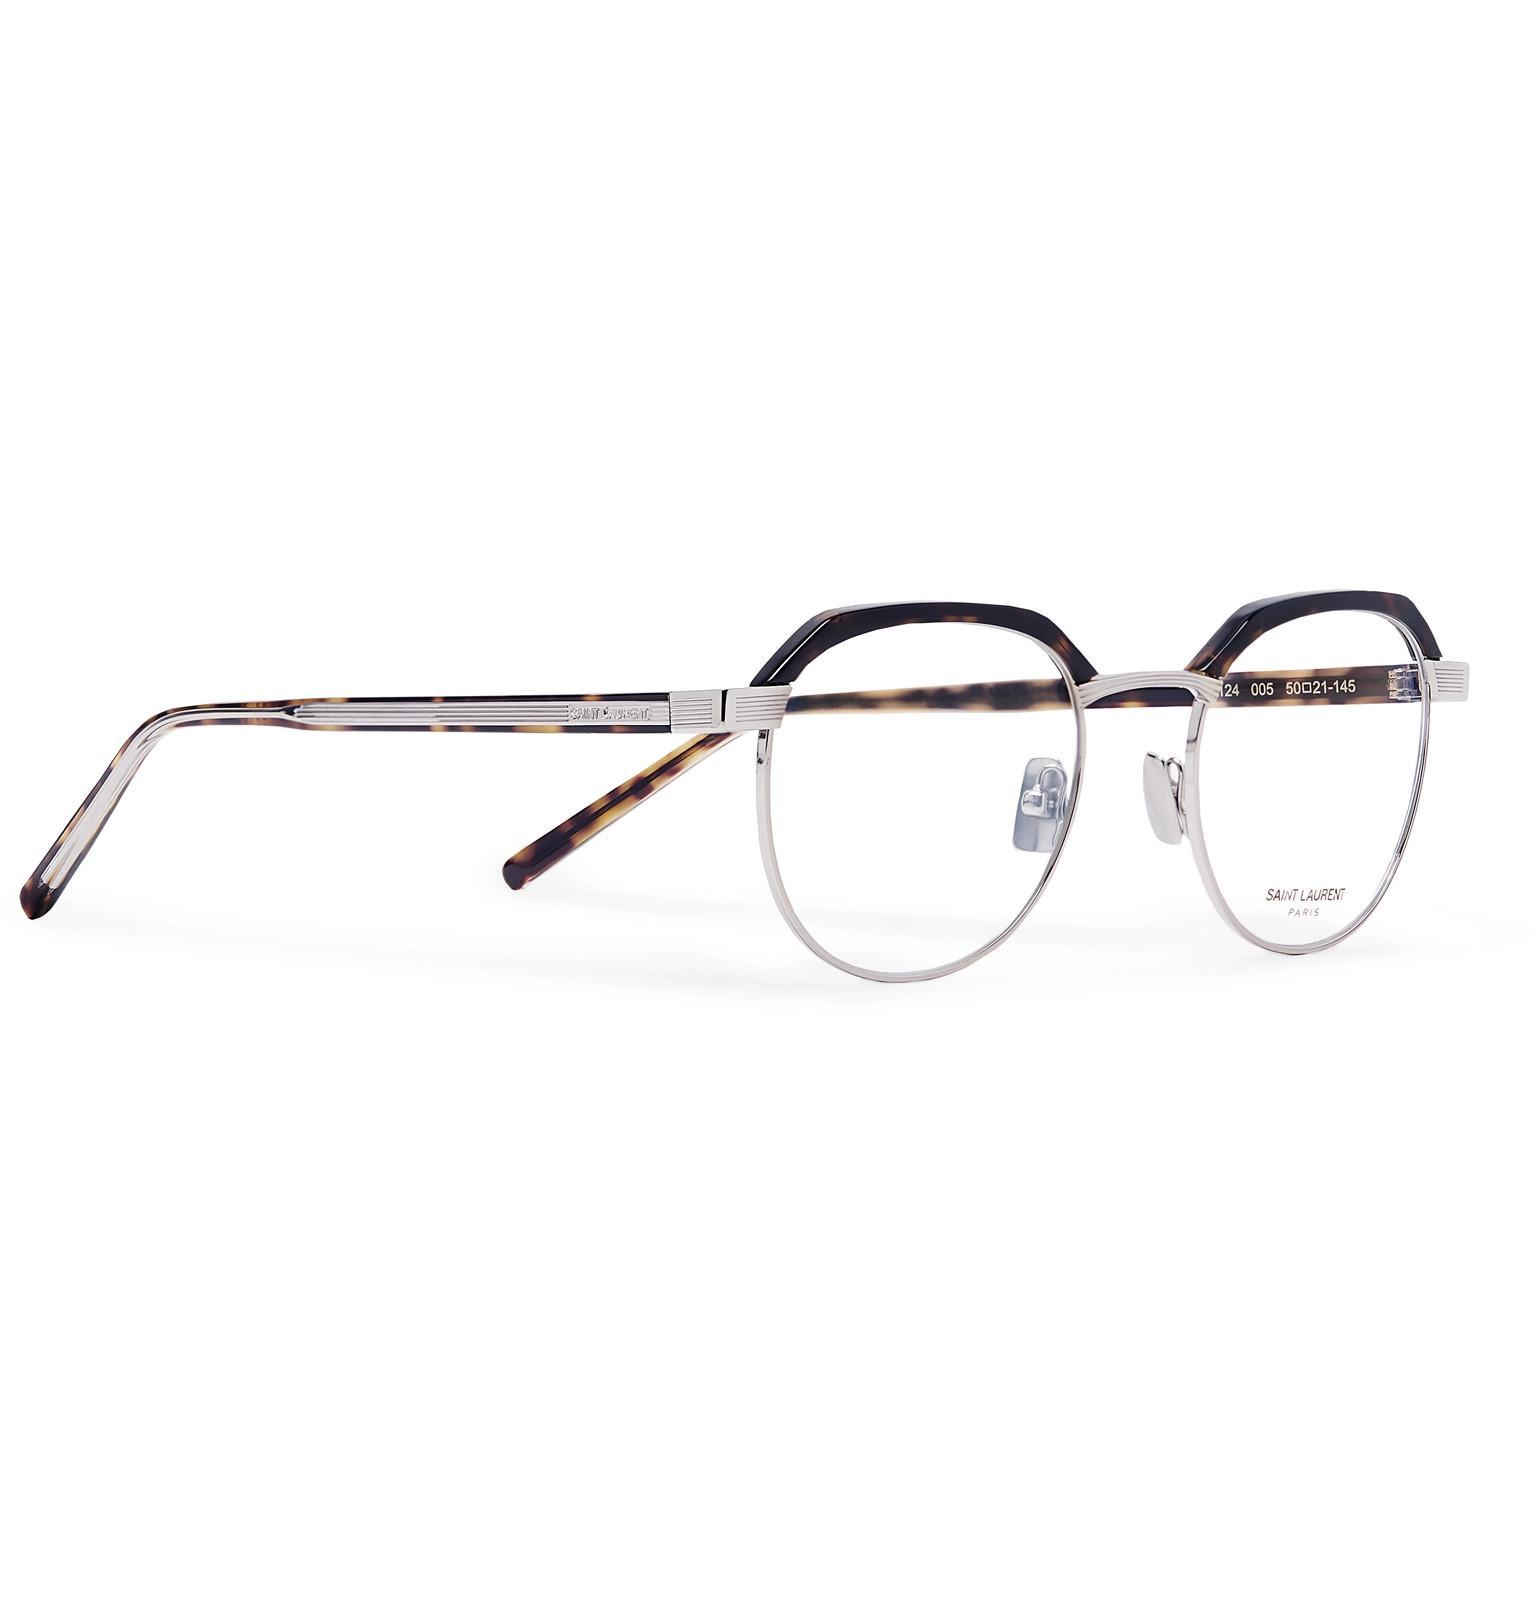 e707b407b3 Saint Laurent - Metallic Round-frame Tortoiseshell Acetate And Silver-tone  Optical Glasses for. View fullscreen